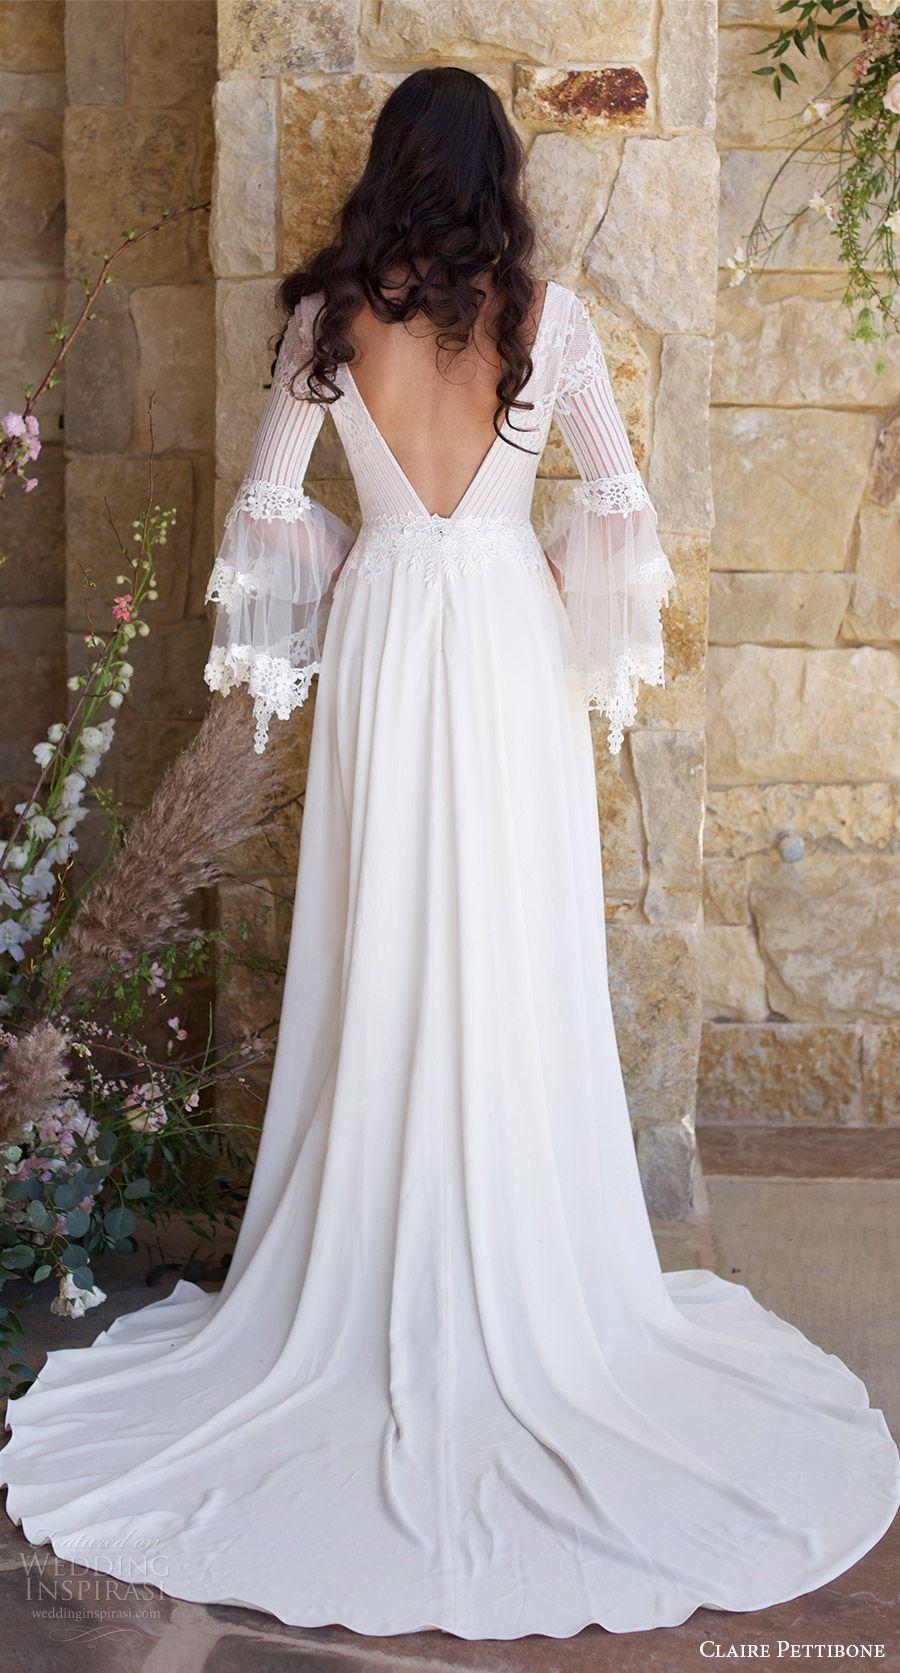 Claire Pettibone Romantique Spring 2018 Wedding Dresses The Vineyard Bridal Collection Wedding Inspirasi Bell Sleeve Wedding Dress Long Wedding Dresses Aline Wedding Dress [ 1673 x 900 Pixel ]